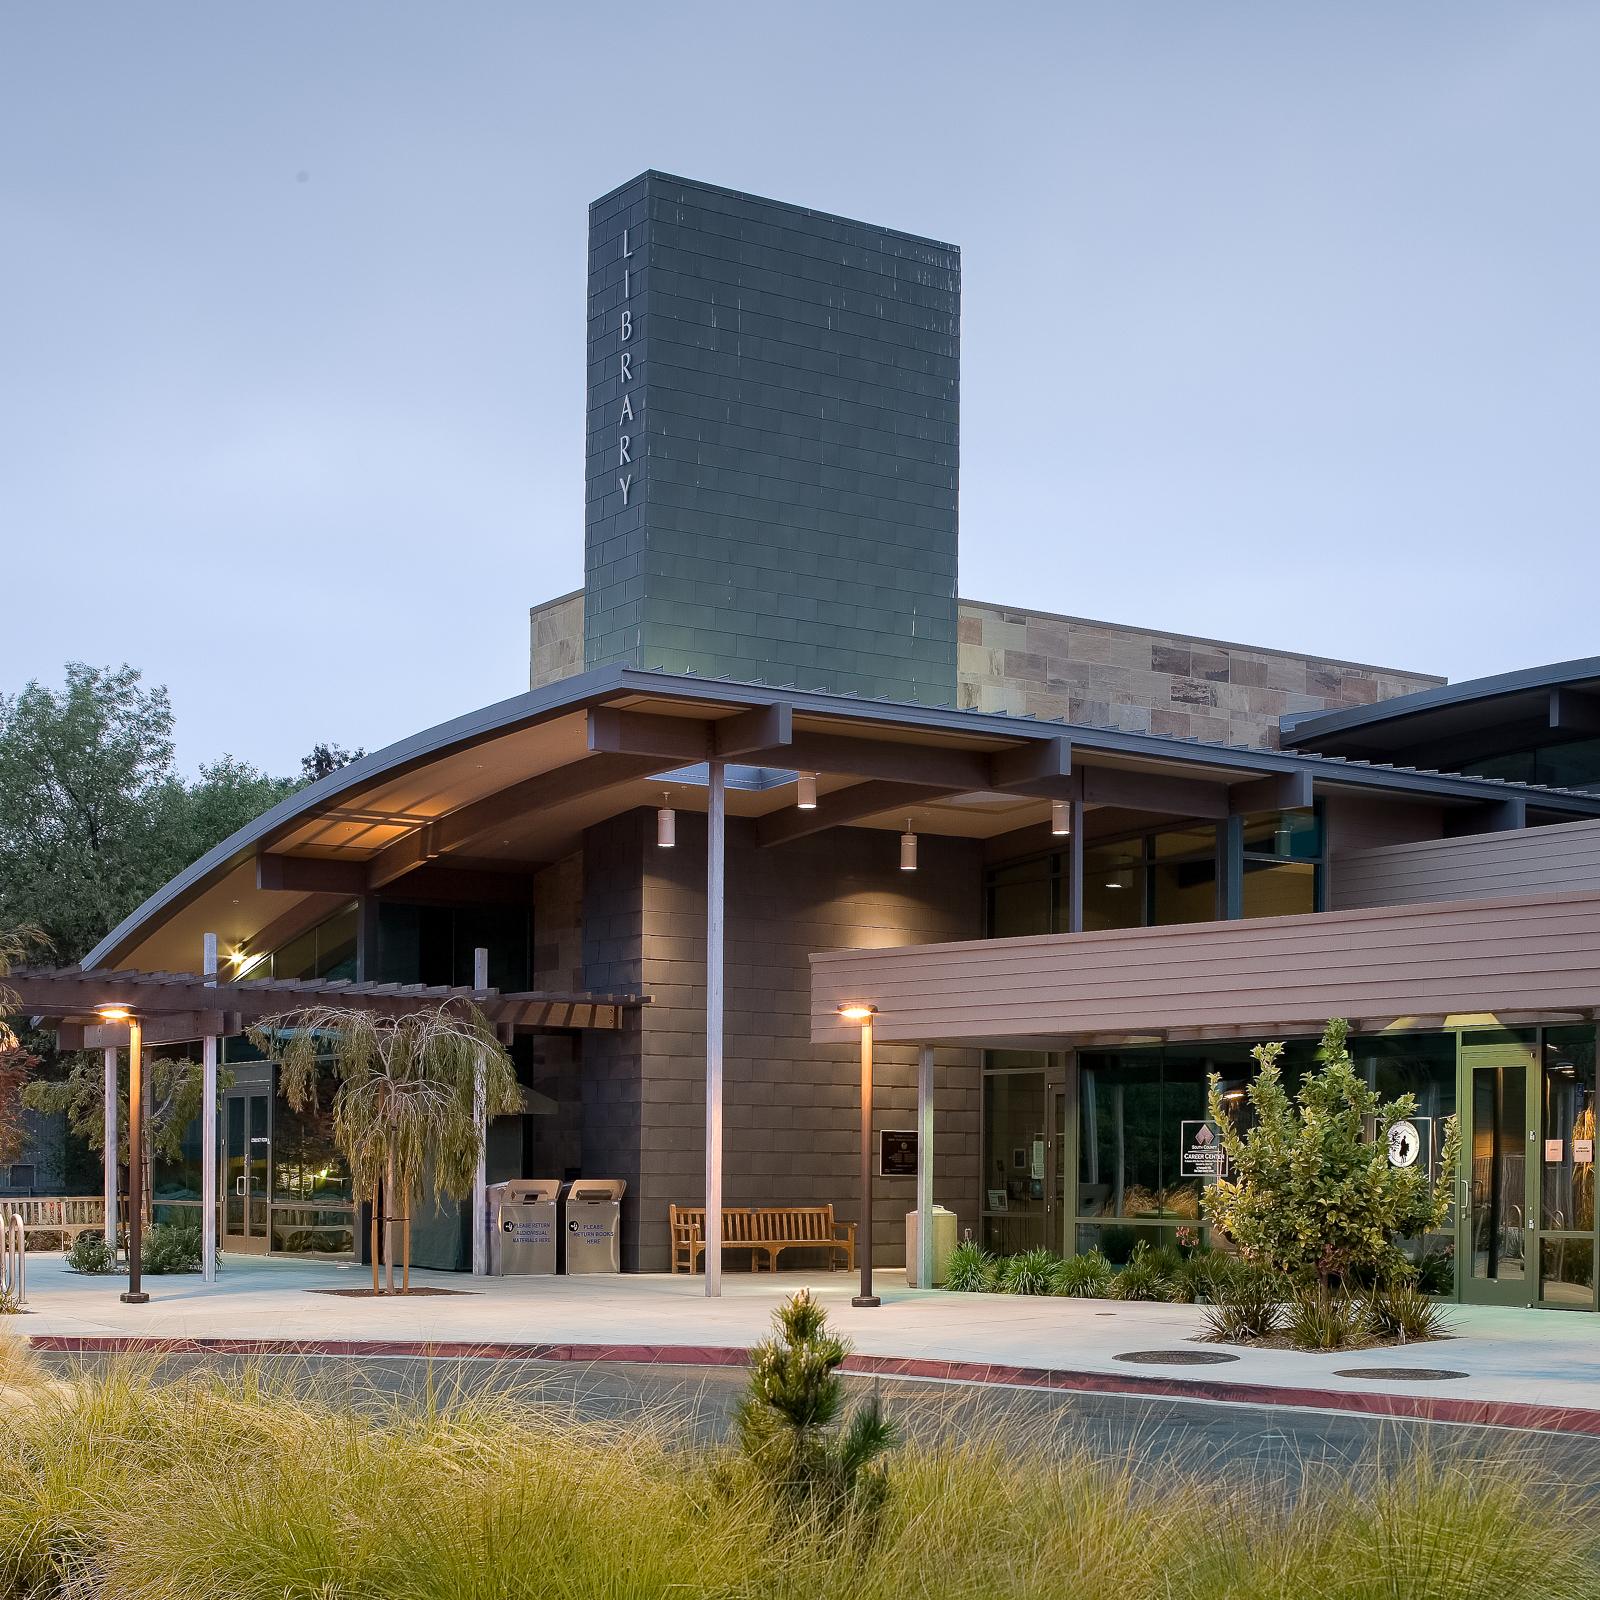 domusstudio-architecture-bonita-library-feature